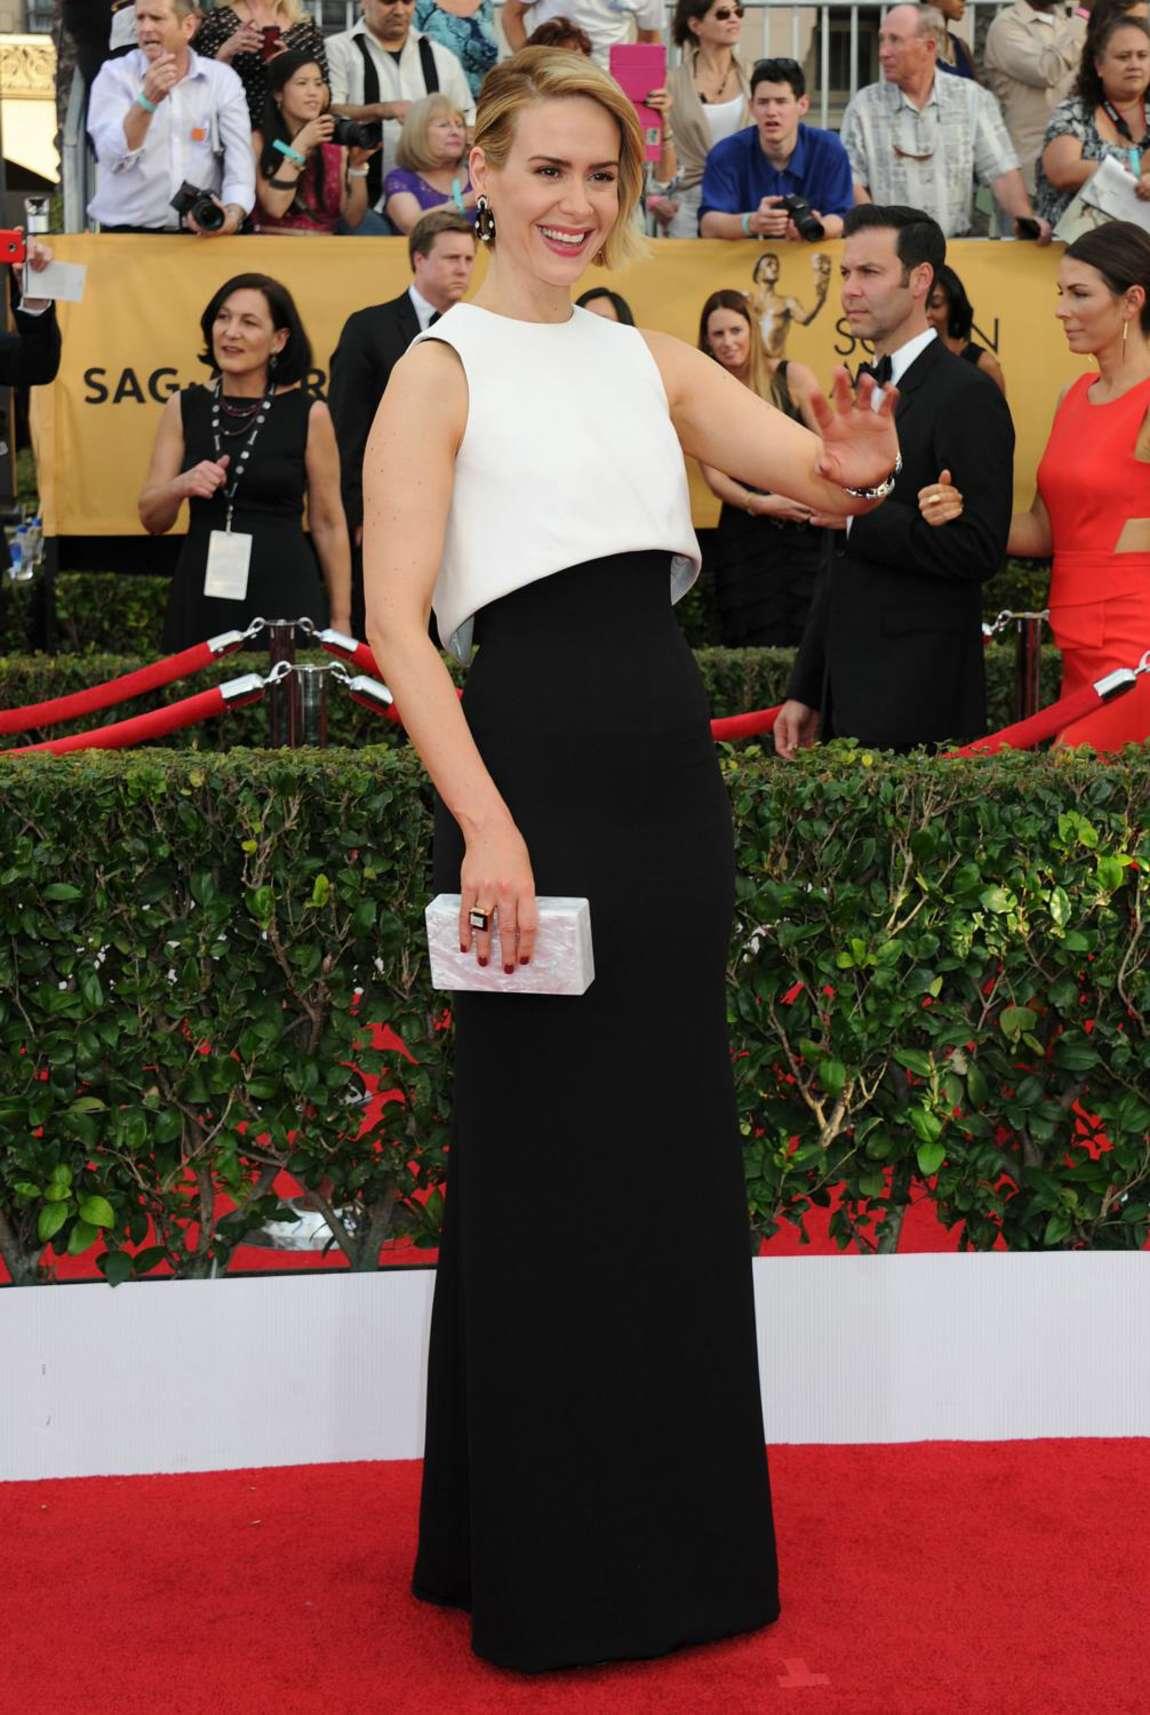 Sarah Paulson 2015 : Sarah Paulson: 2015 SAG Awards -05